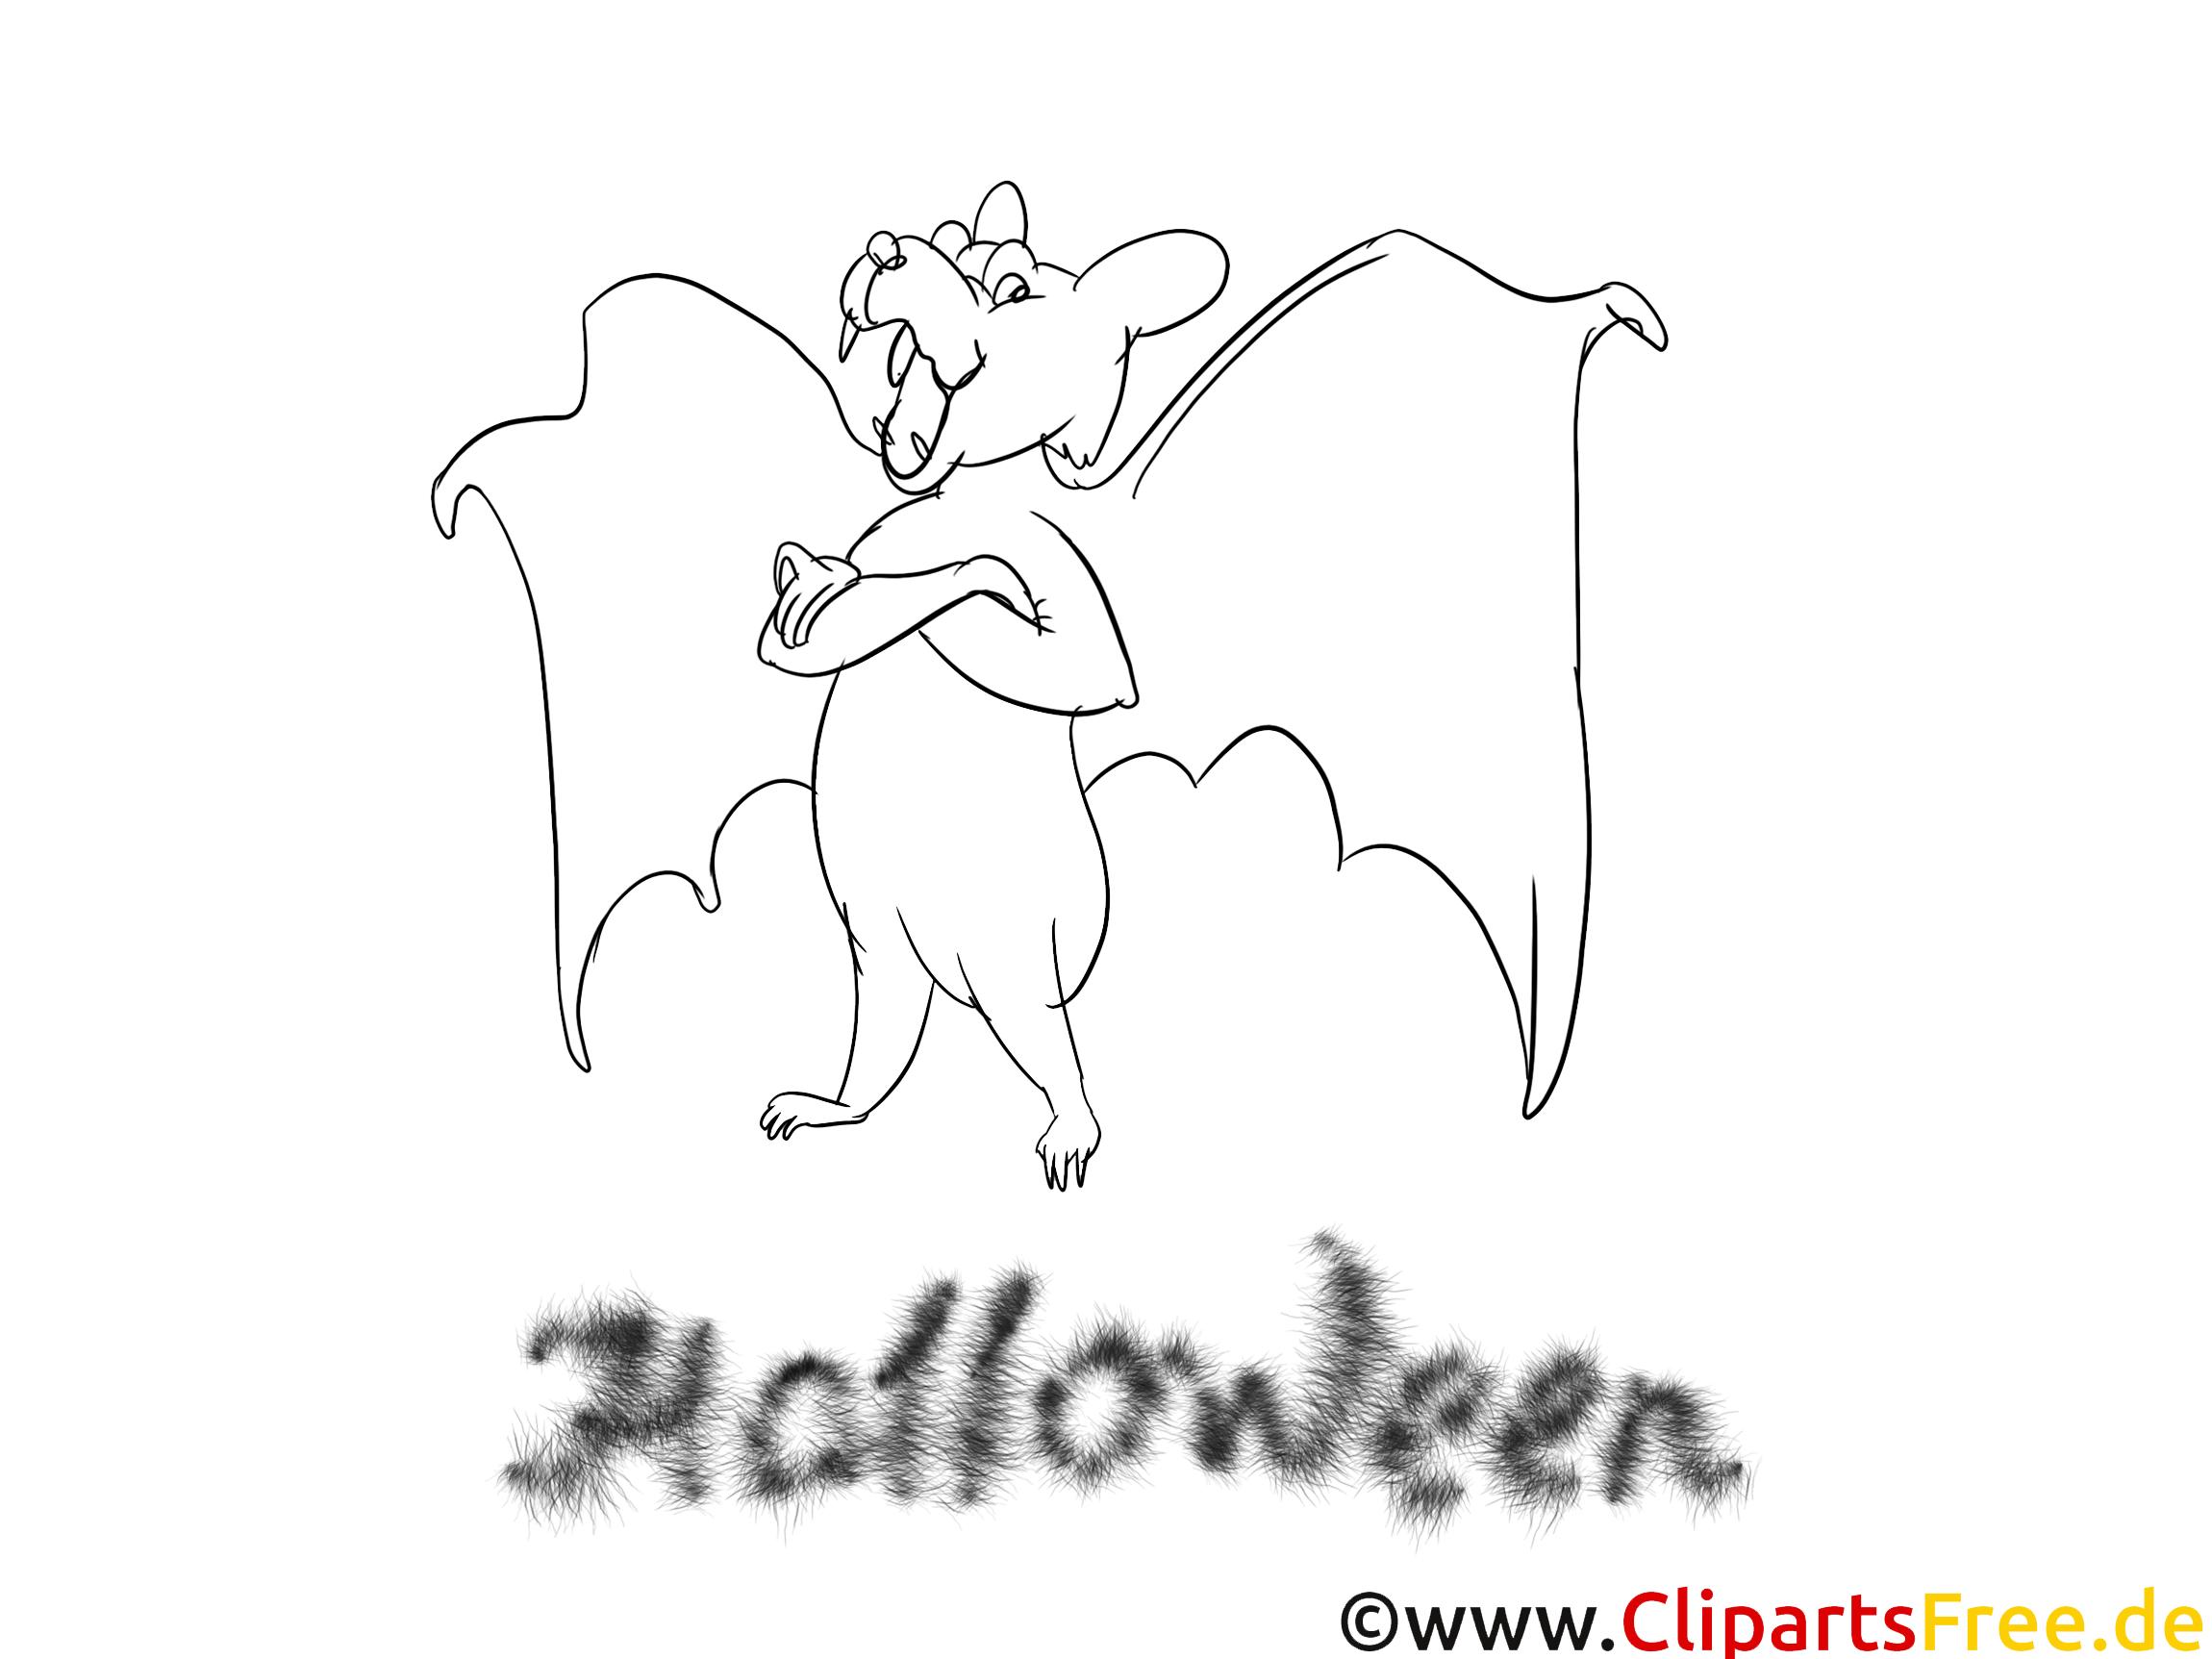 Malbild zu Halloween